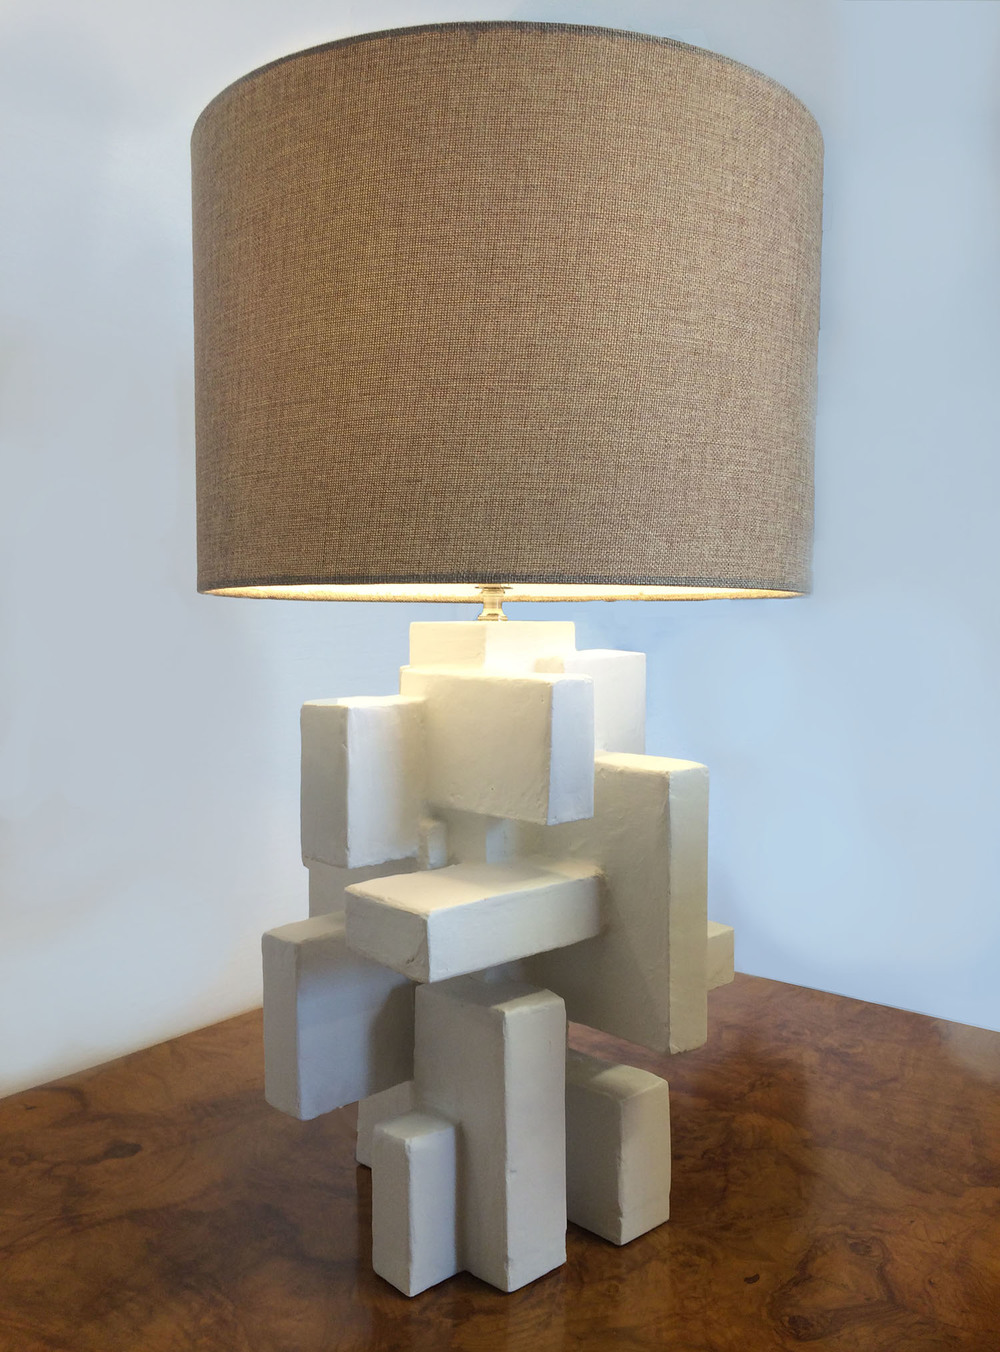 "ABITARE TABLE LAMP II, Mixed Media, 16"" X 10"" X 10"", 2012"